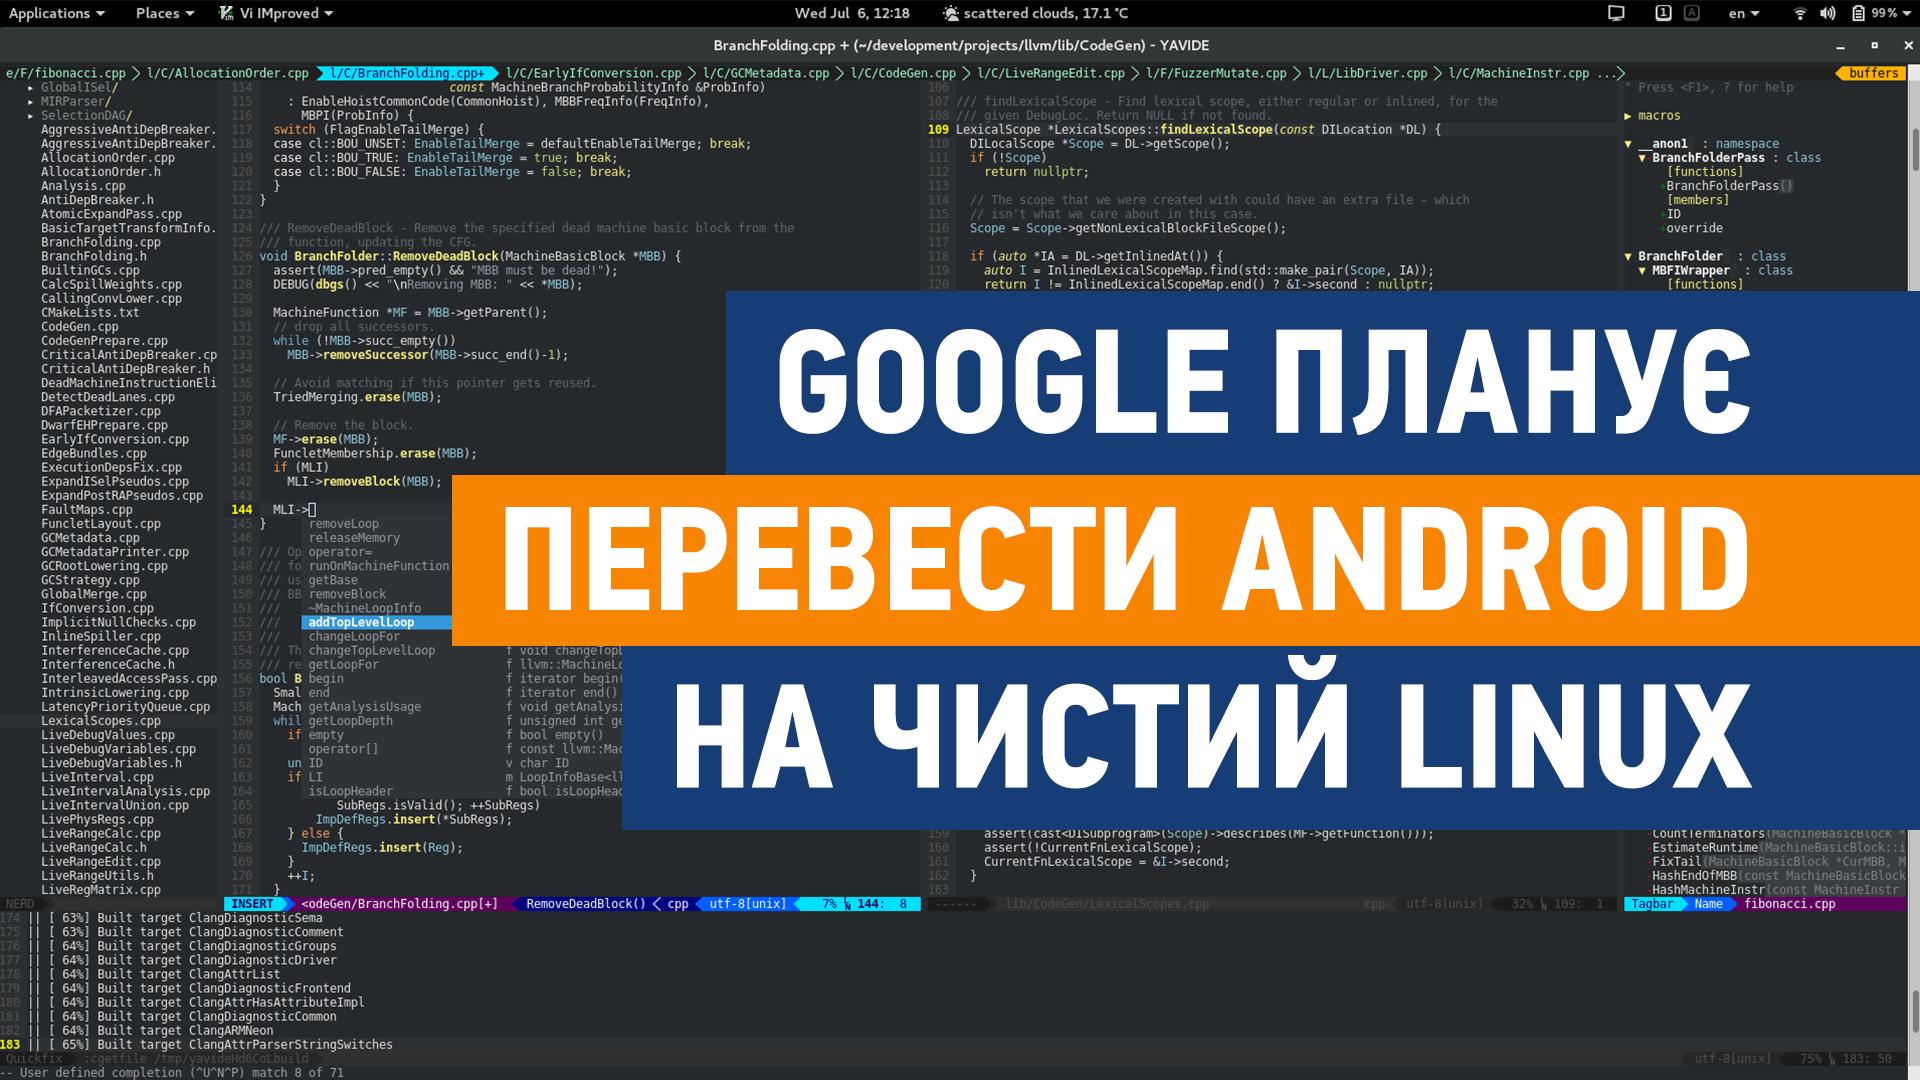 Google планує перевести Android на чистий Linux - google, android - android poglyad 1